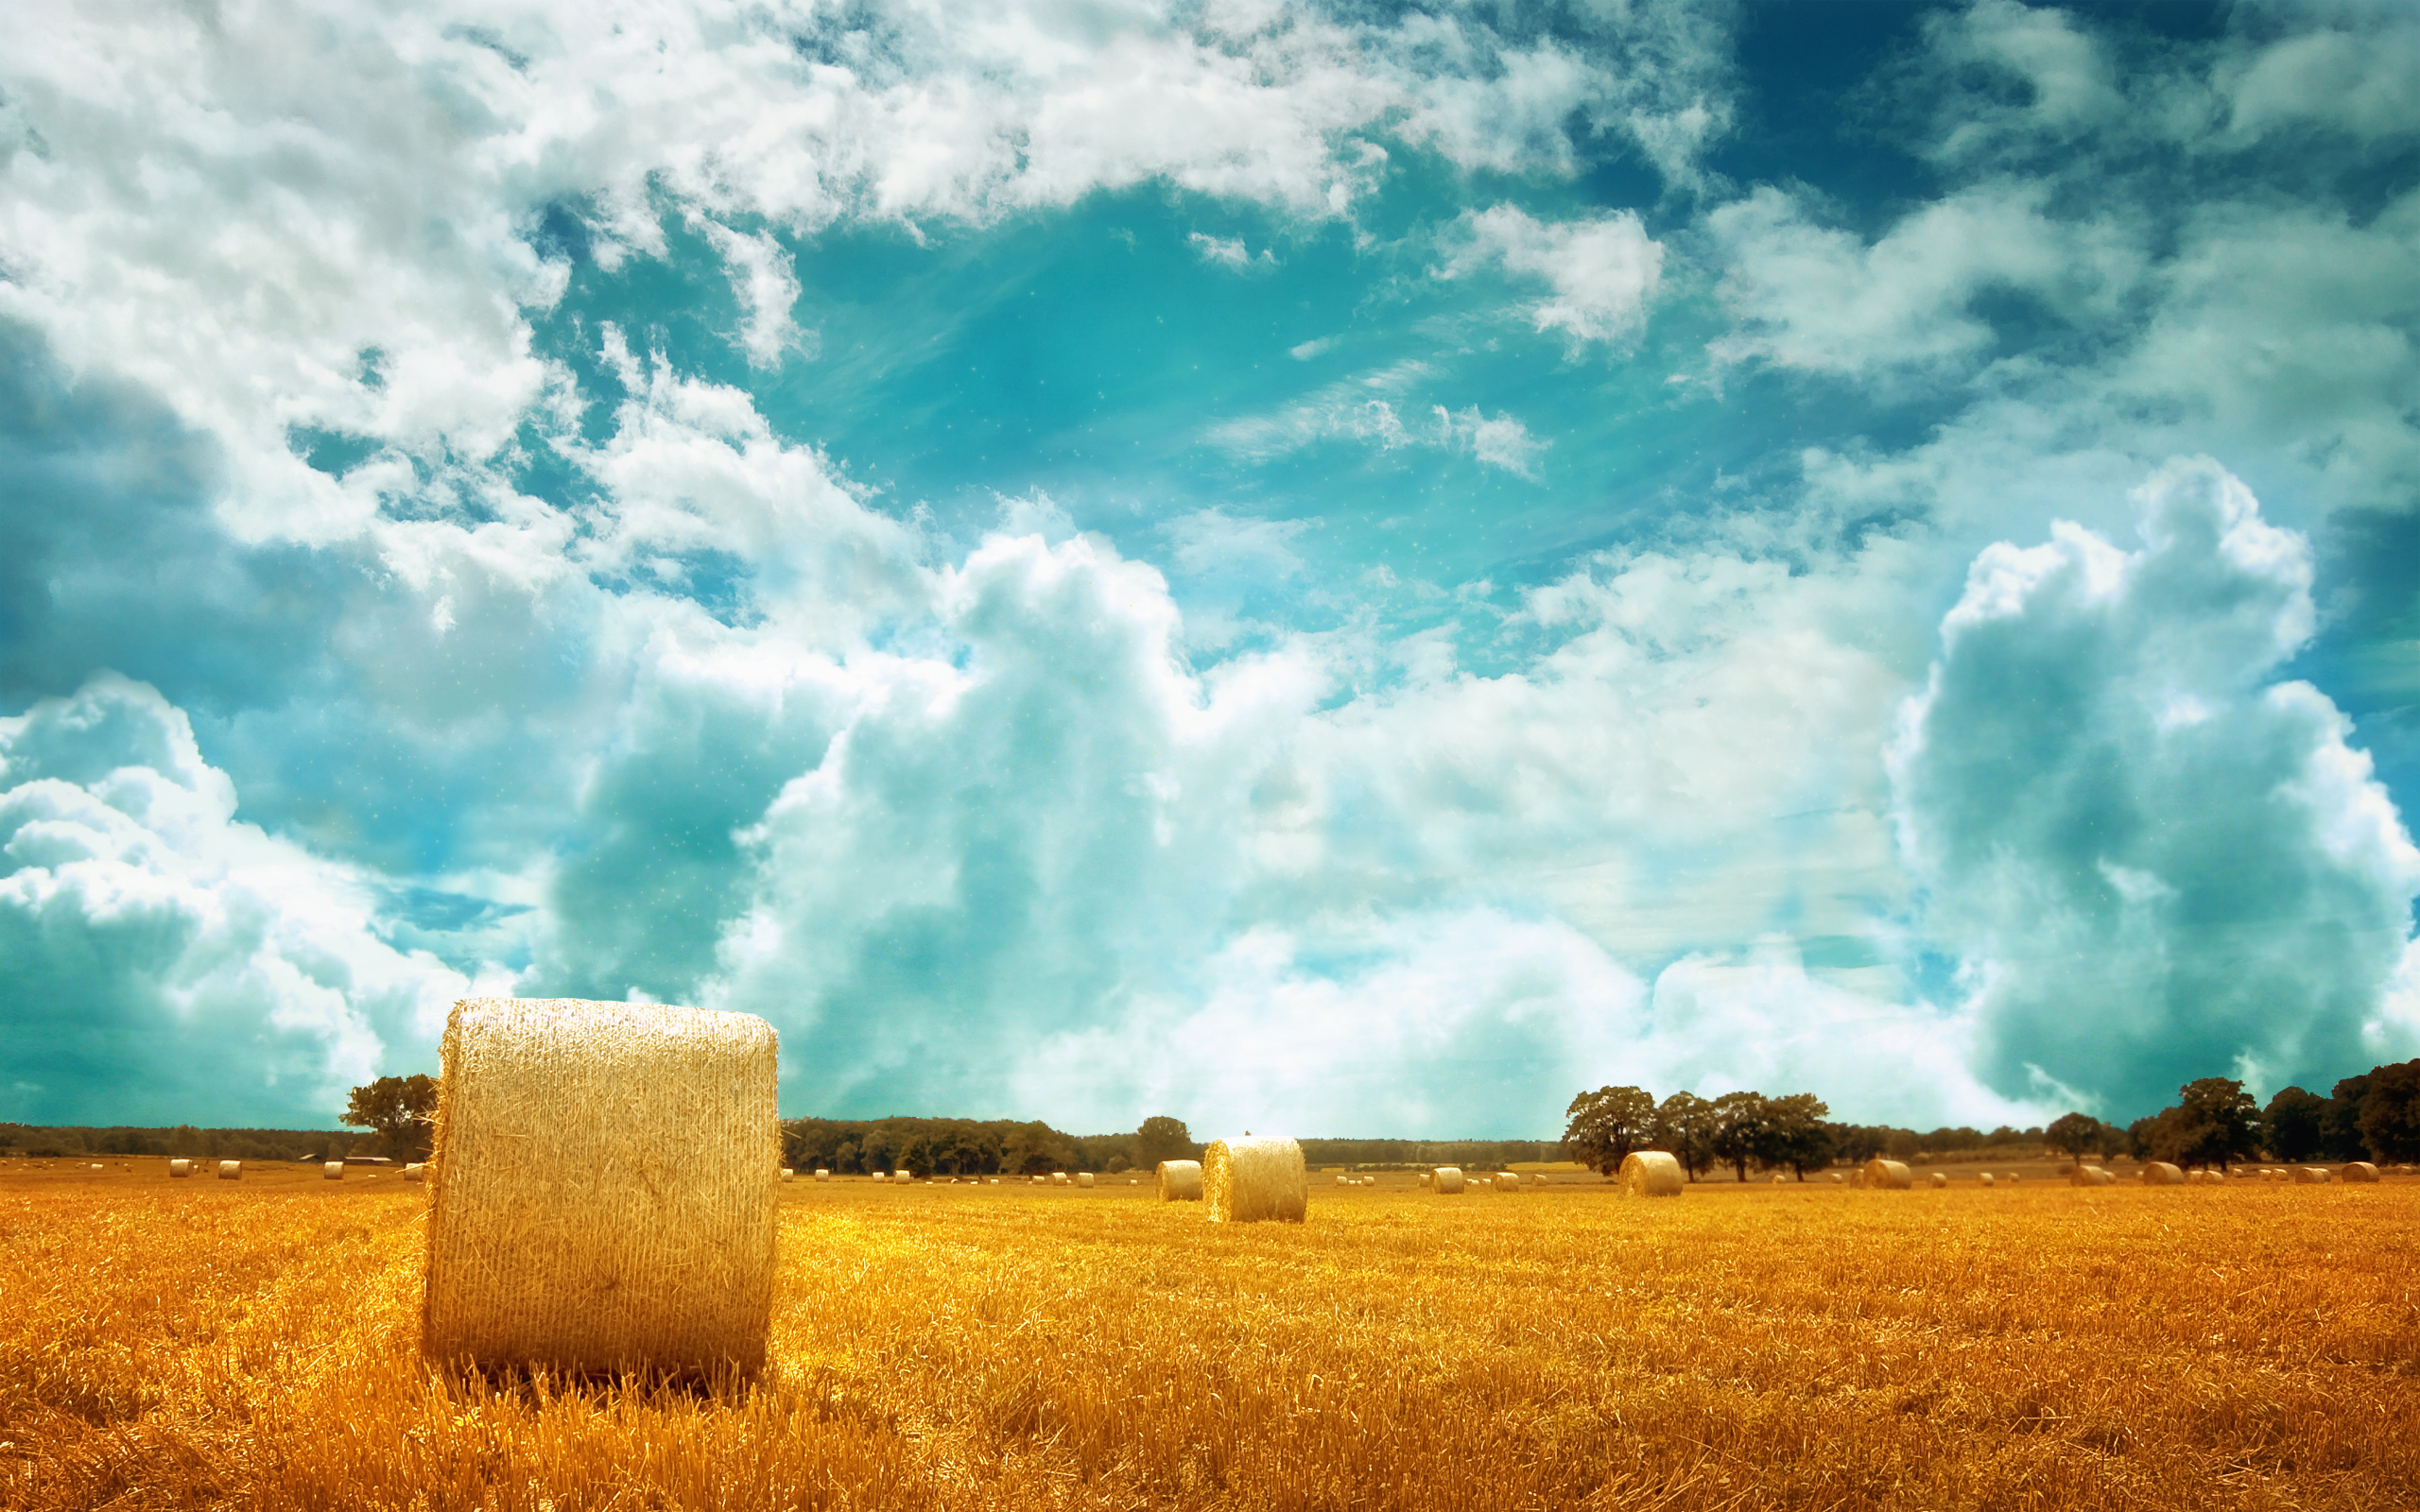 fondos nubes adnfriki (7)